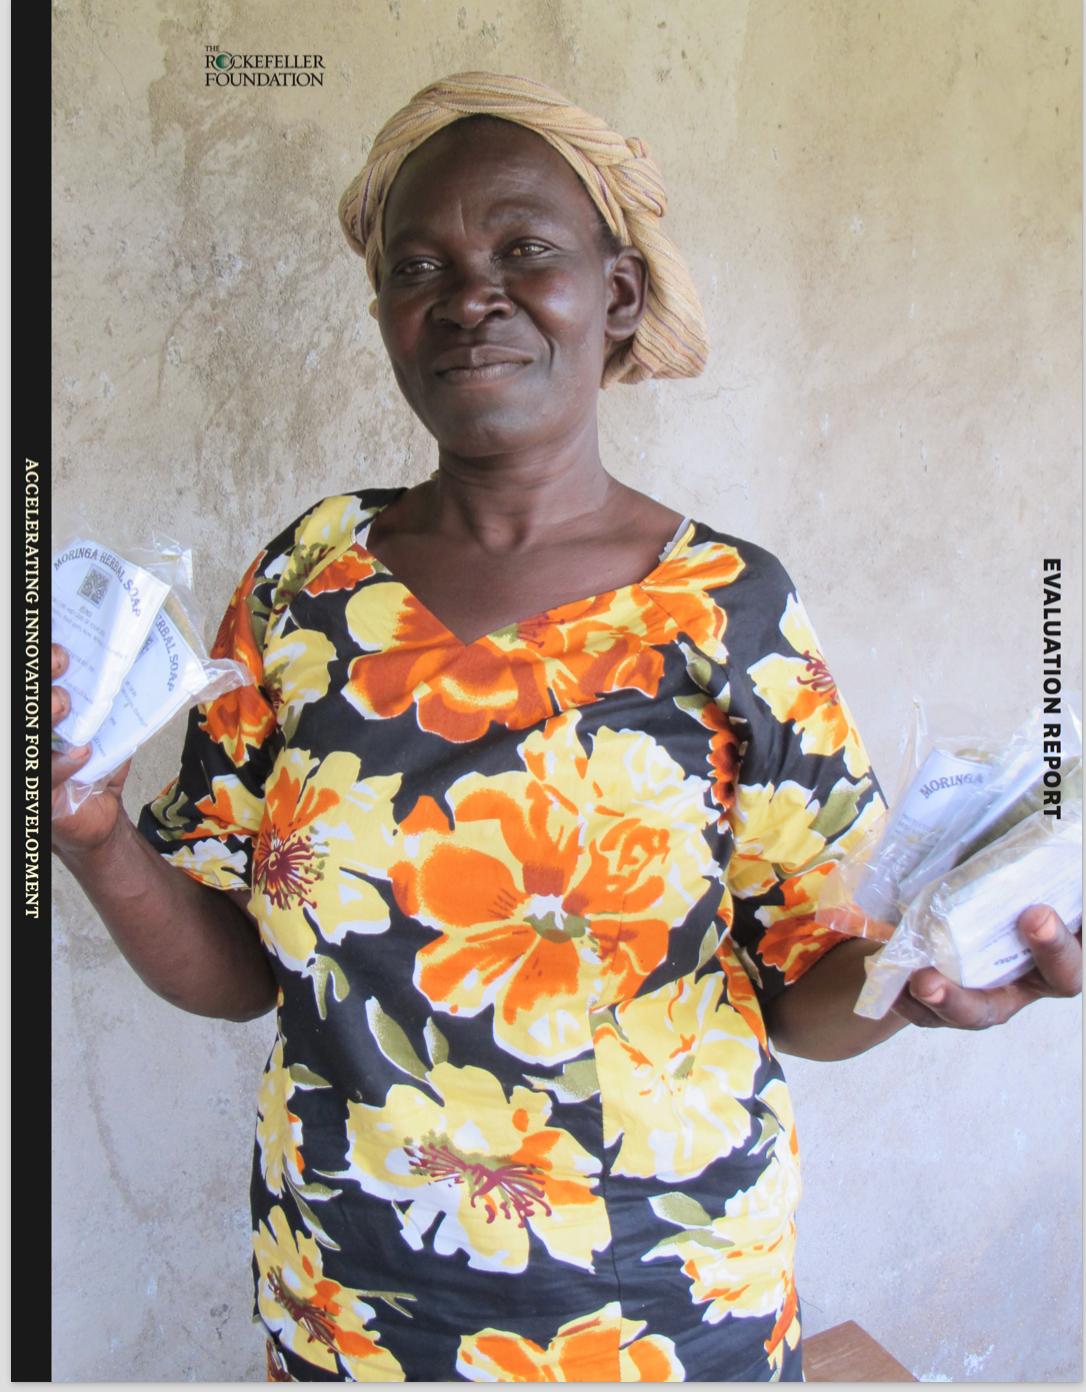 Village level entrepreneur with innovative products, Kenya